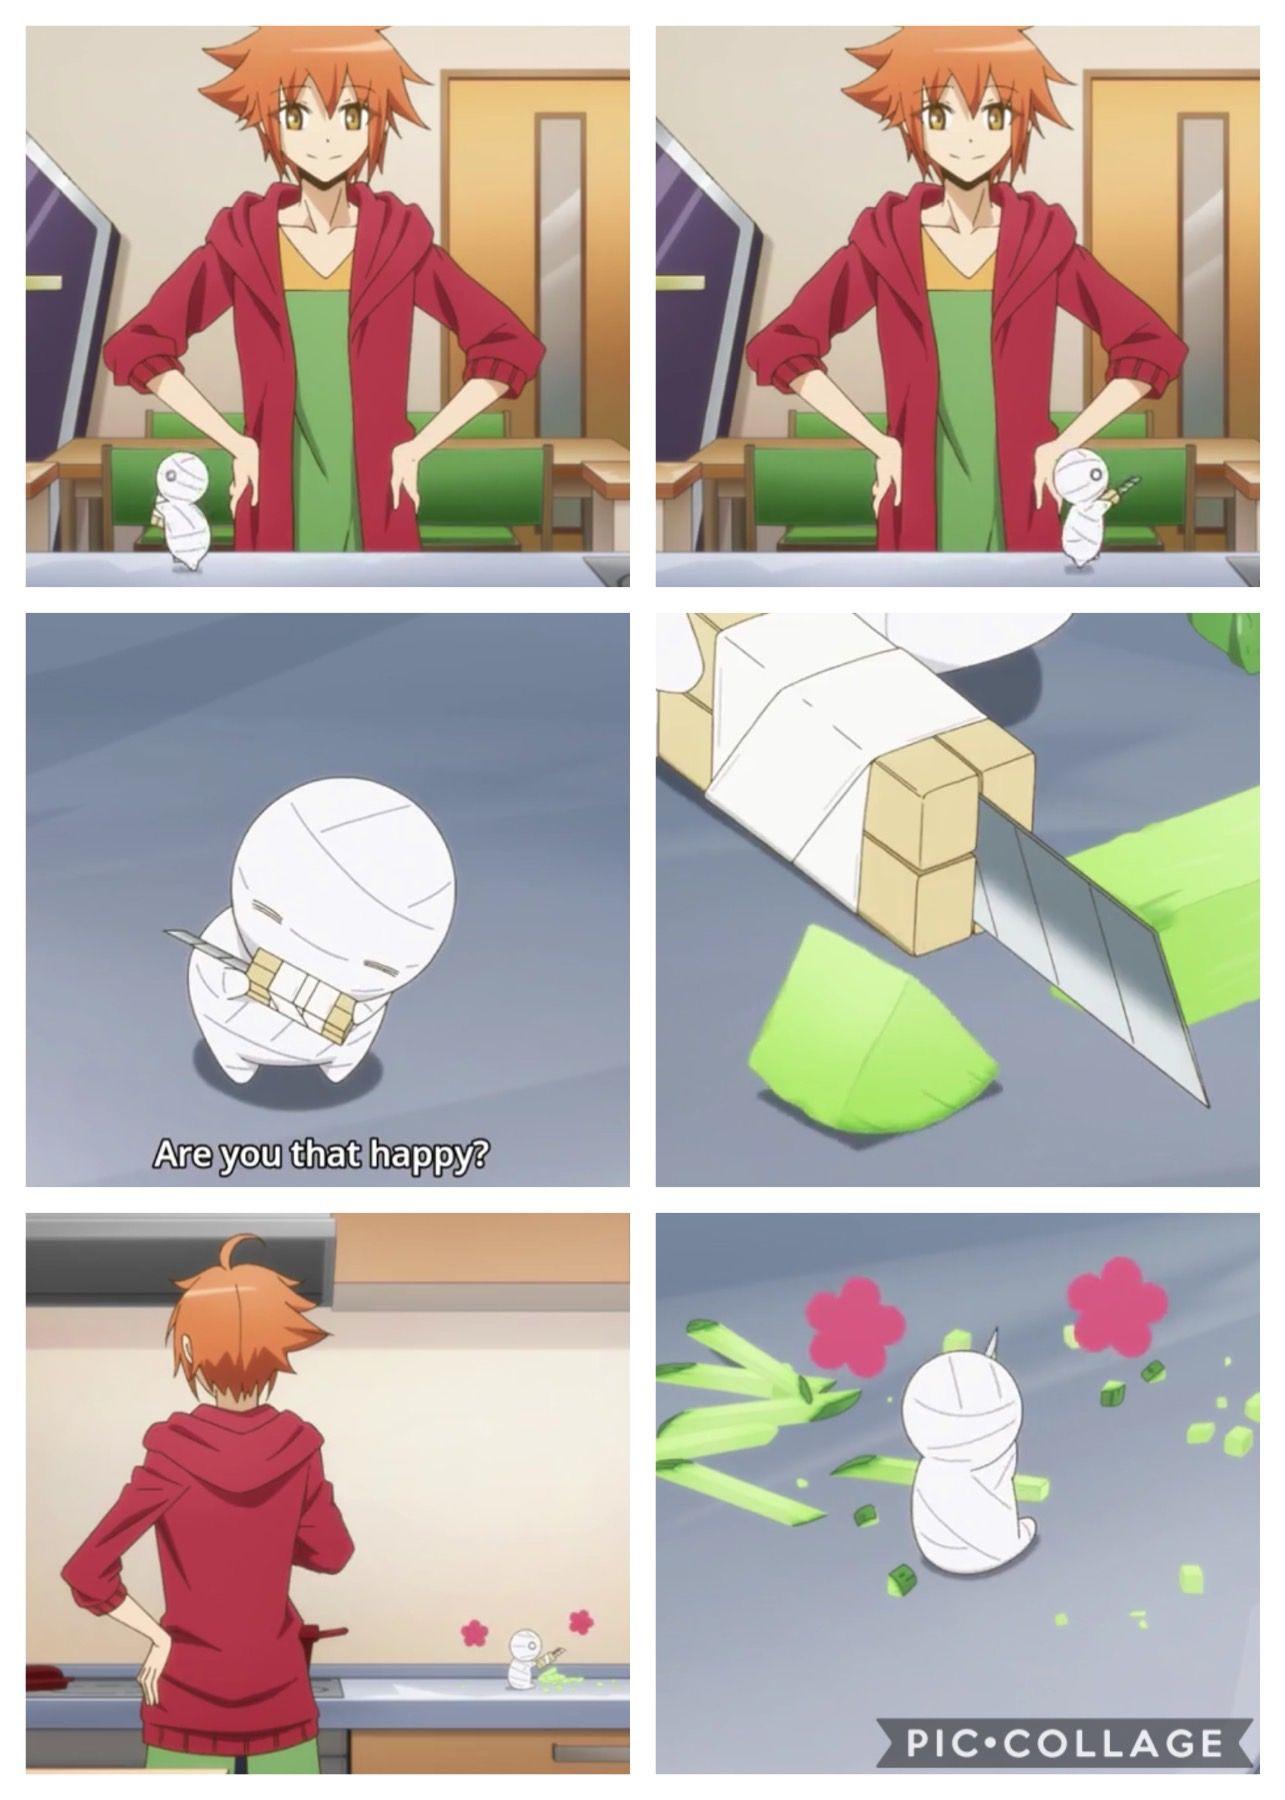 How To Keep A Mummy Miira No Kaikata 2 Cartoon Online Anime Anime Lovers How to keep a mummy (japanese: how to keep a mummy miira no kaikata